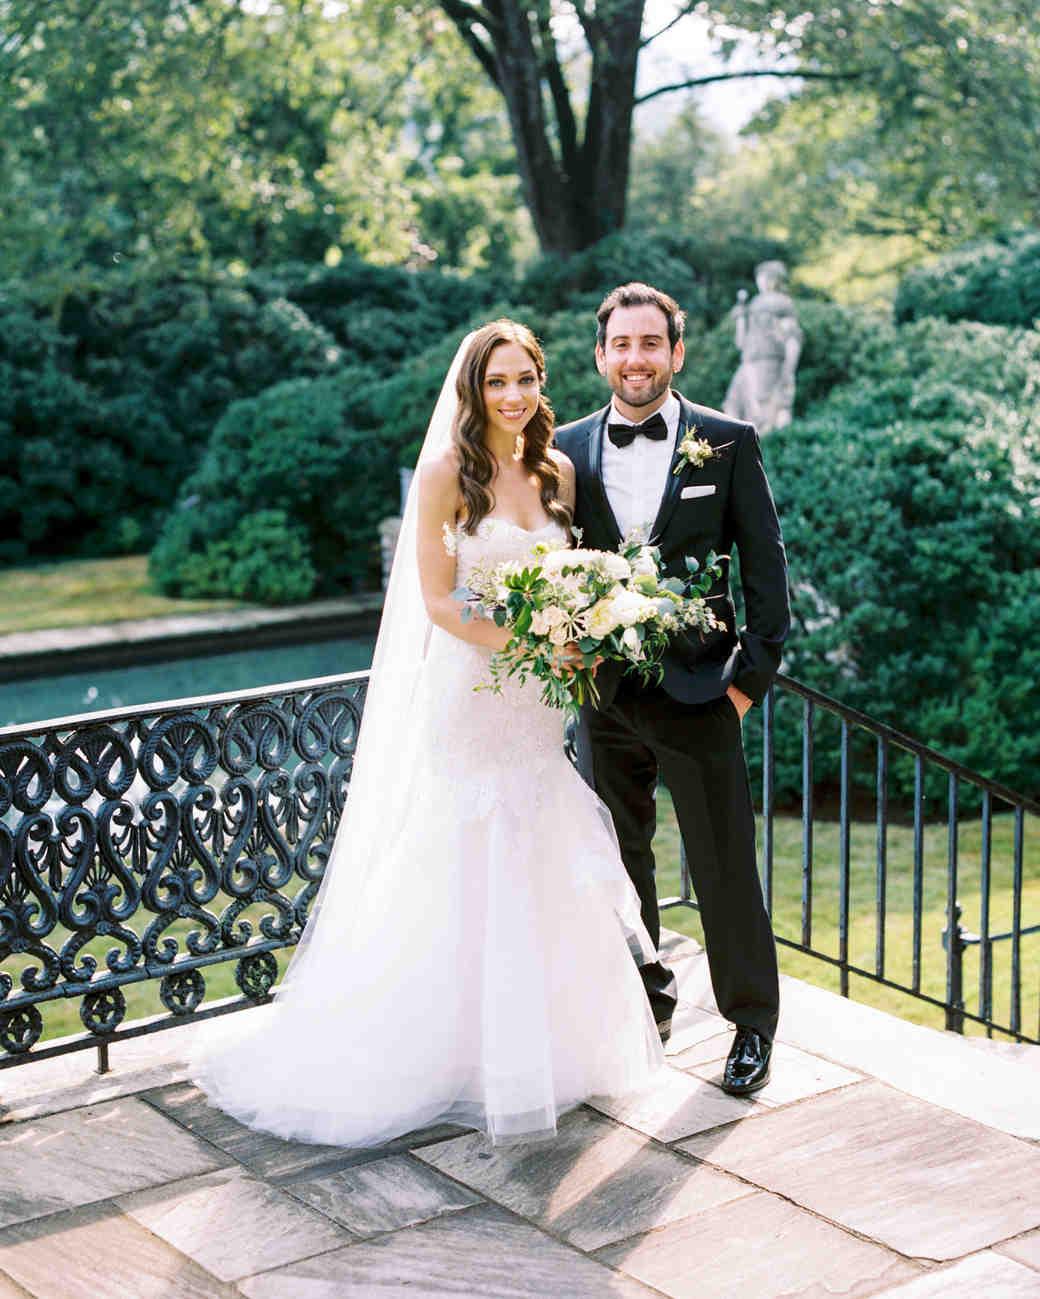 Ross golan wedding